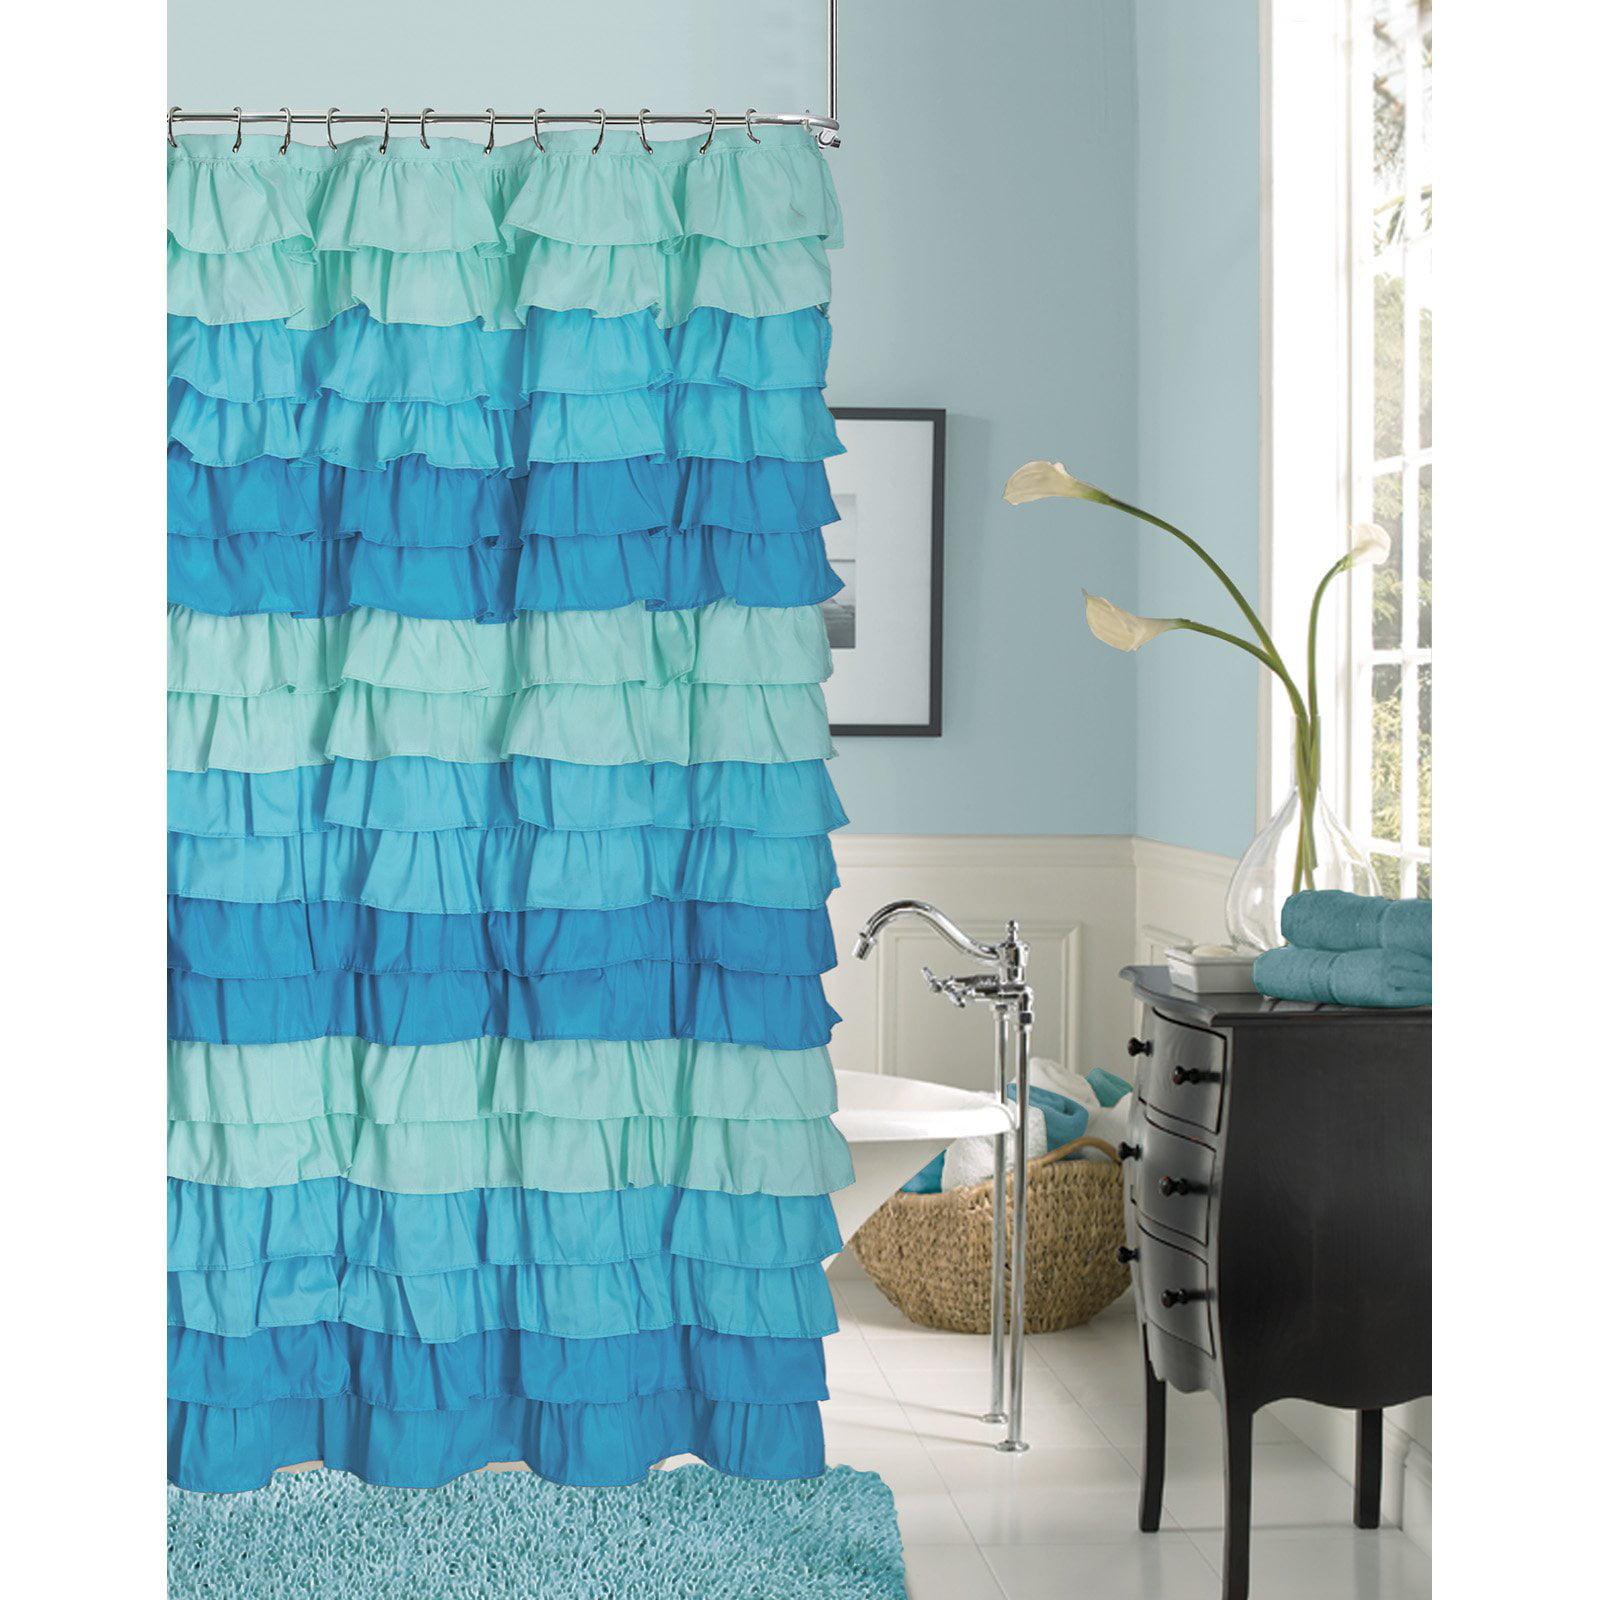 dainty home venezia ruffled shower curtain - walmart